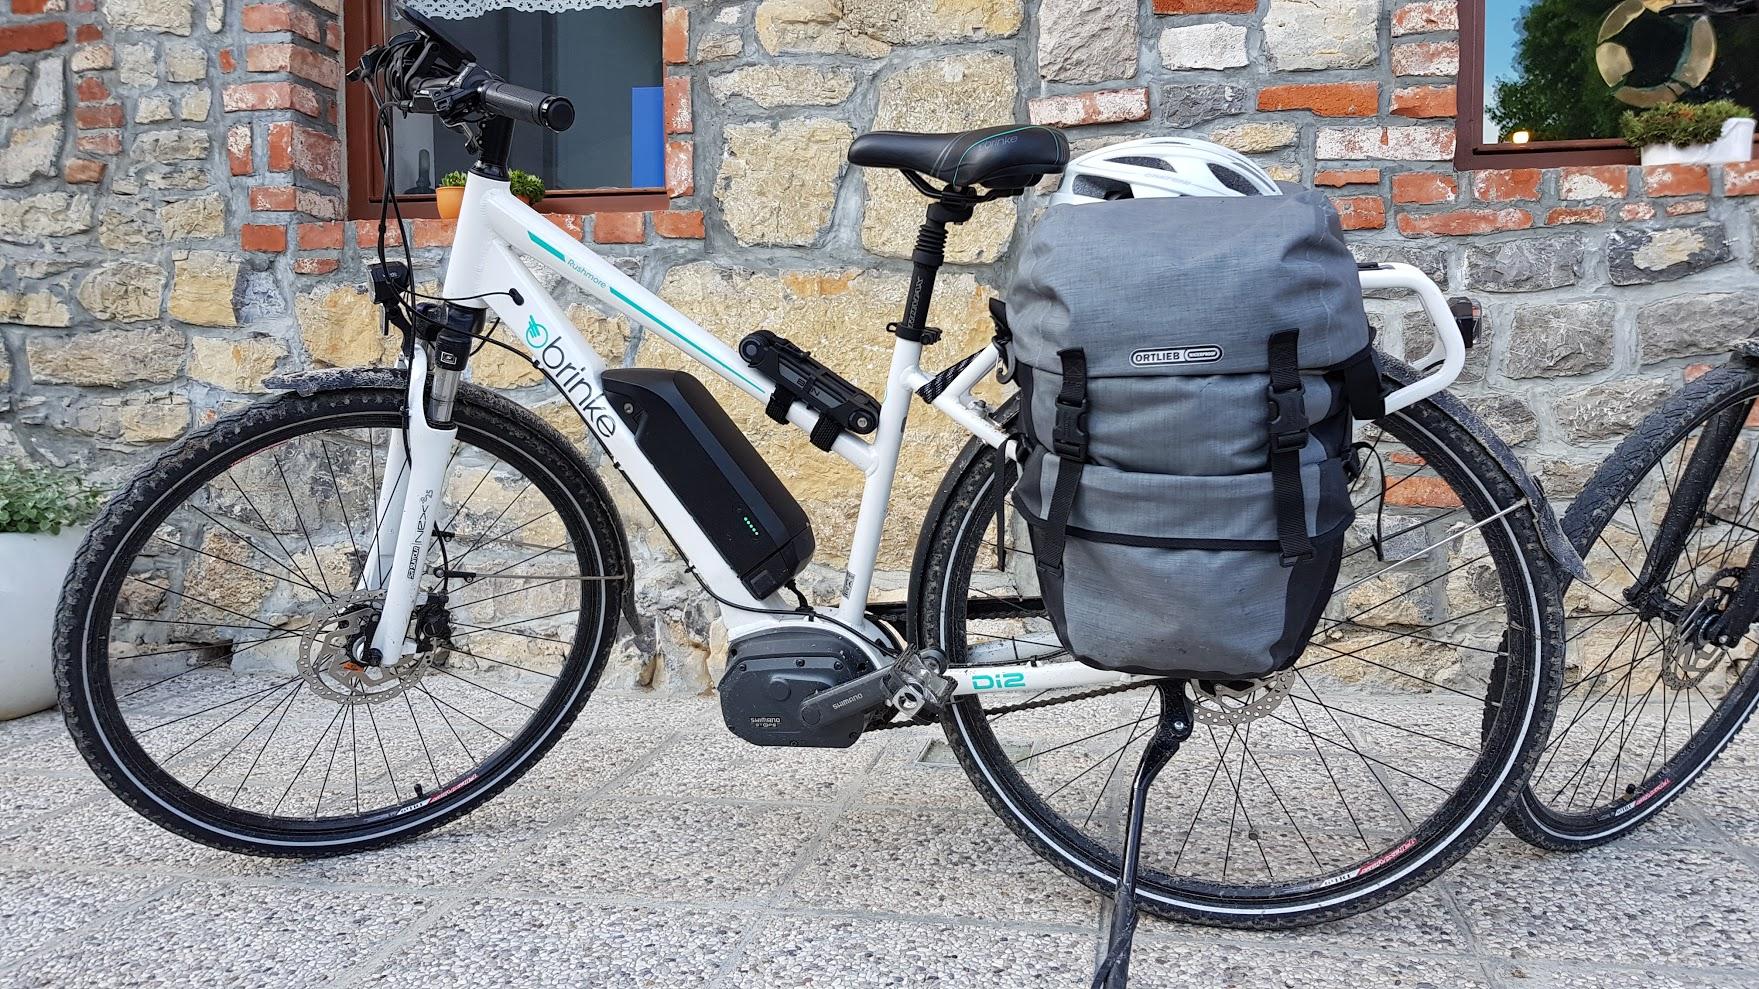 bici brinke